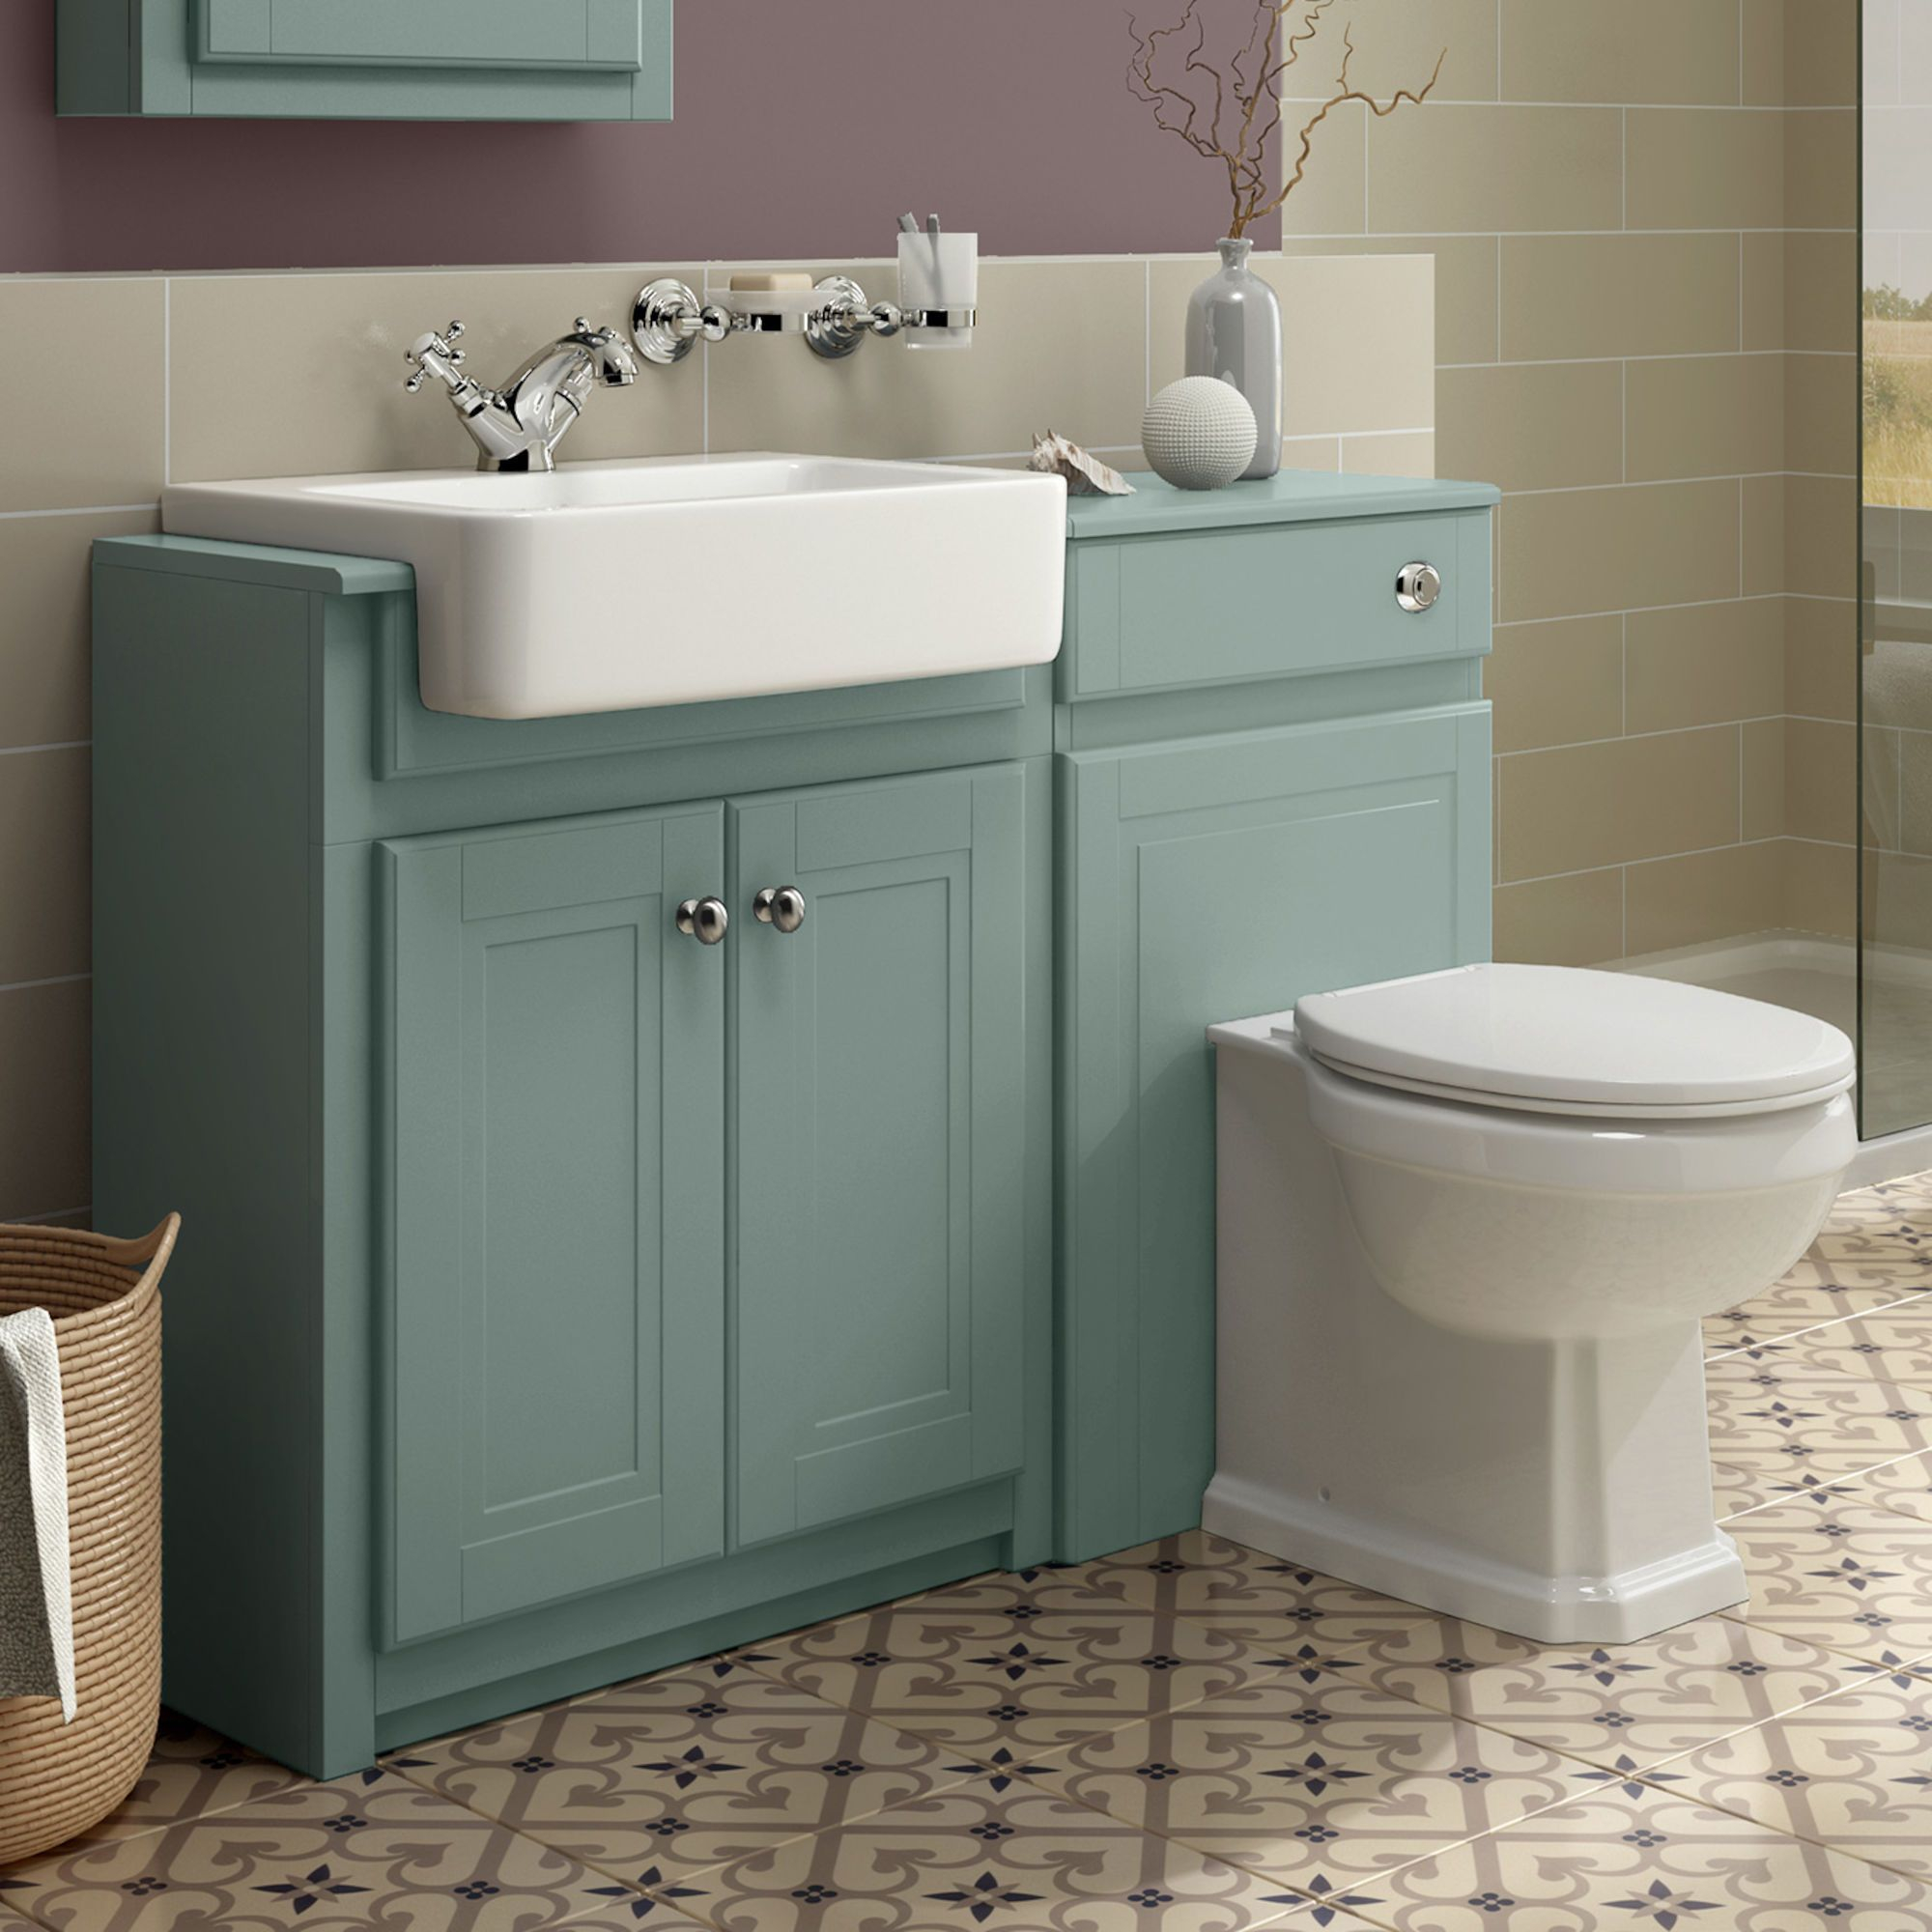 15 Great Toilet Sink Combo Ideas For Best Bathroom Design with regard to measurements 2000 X 2000